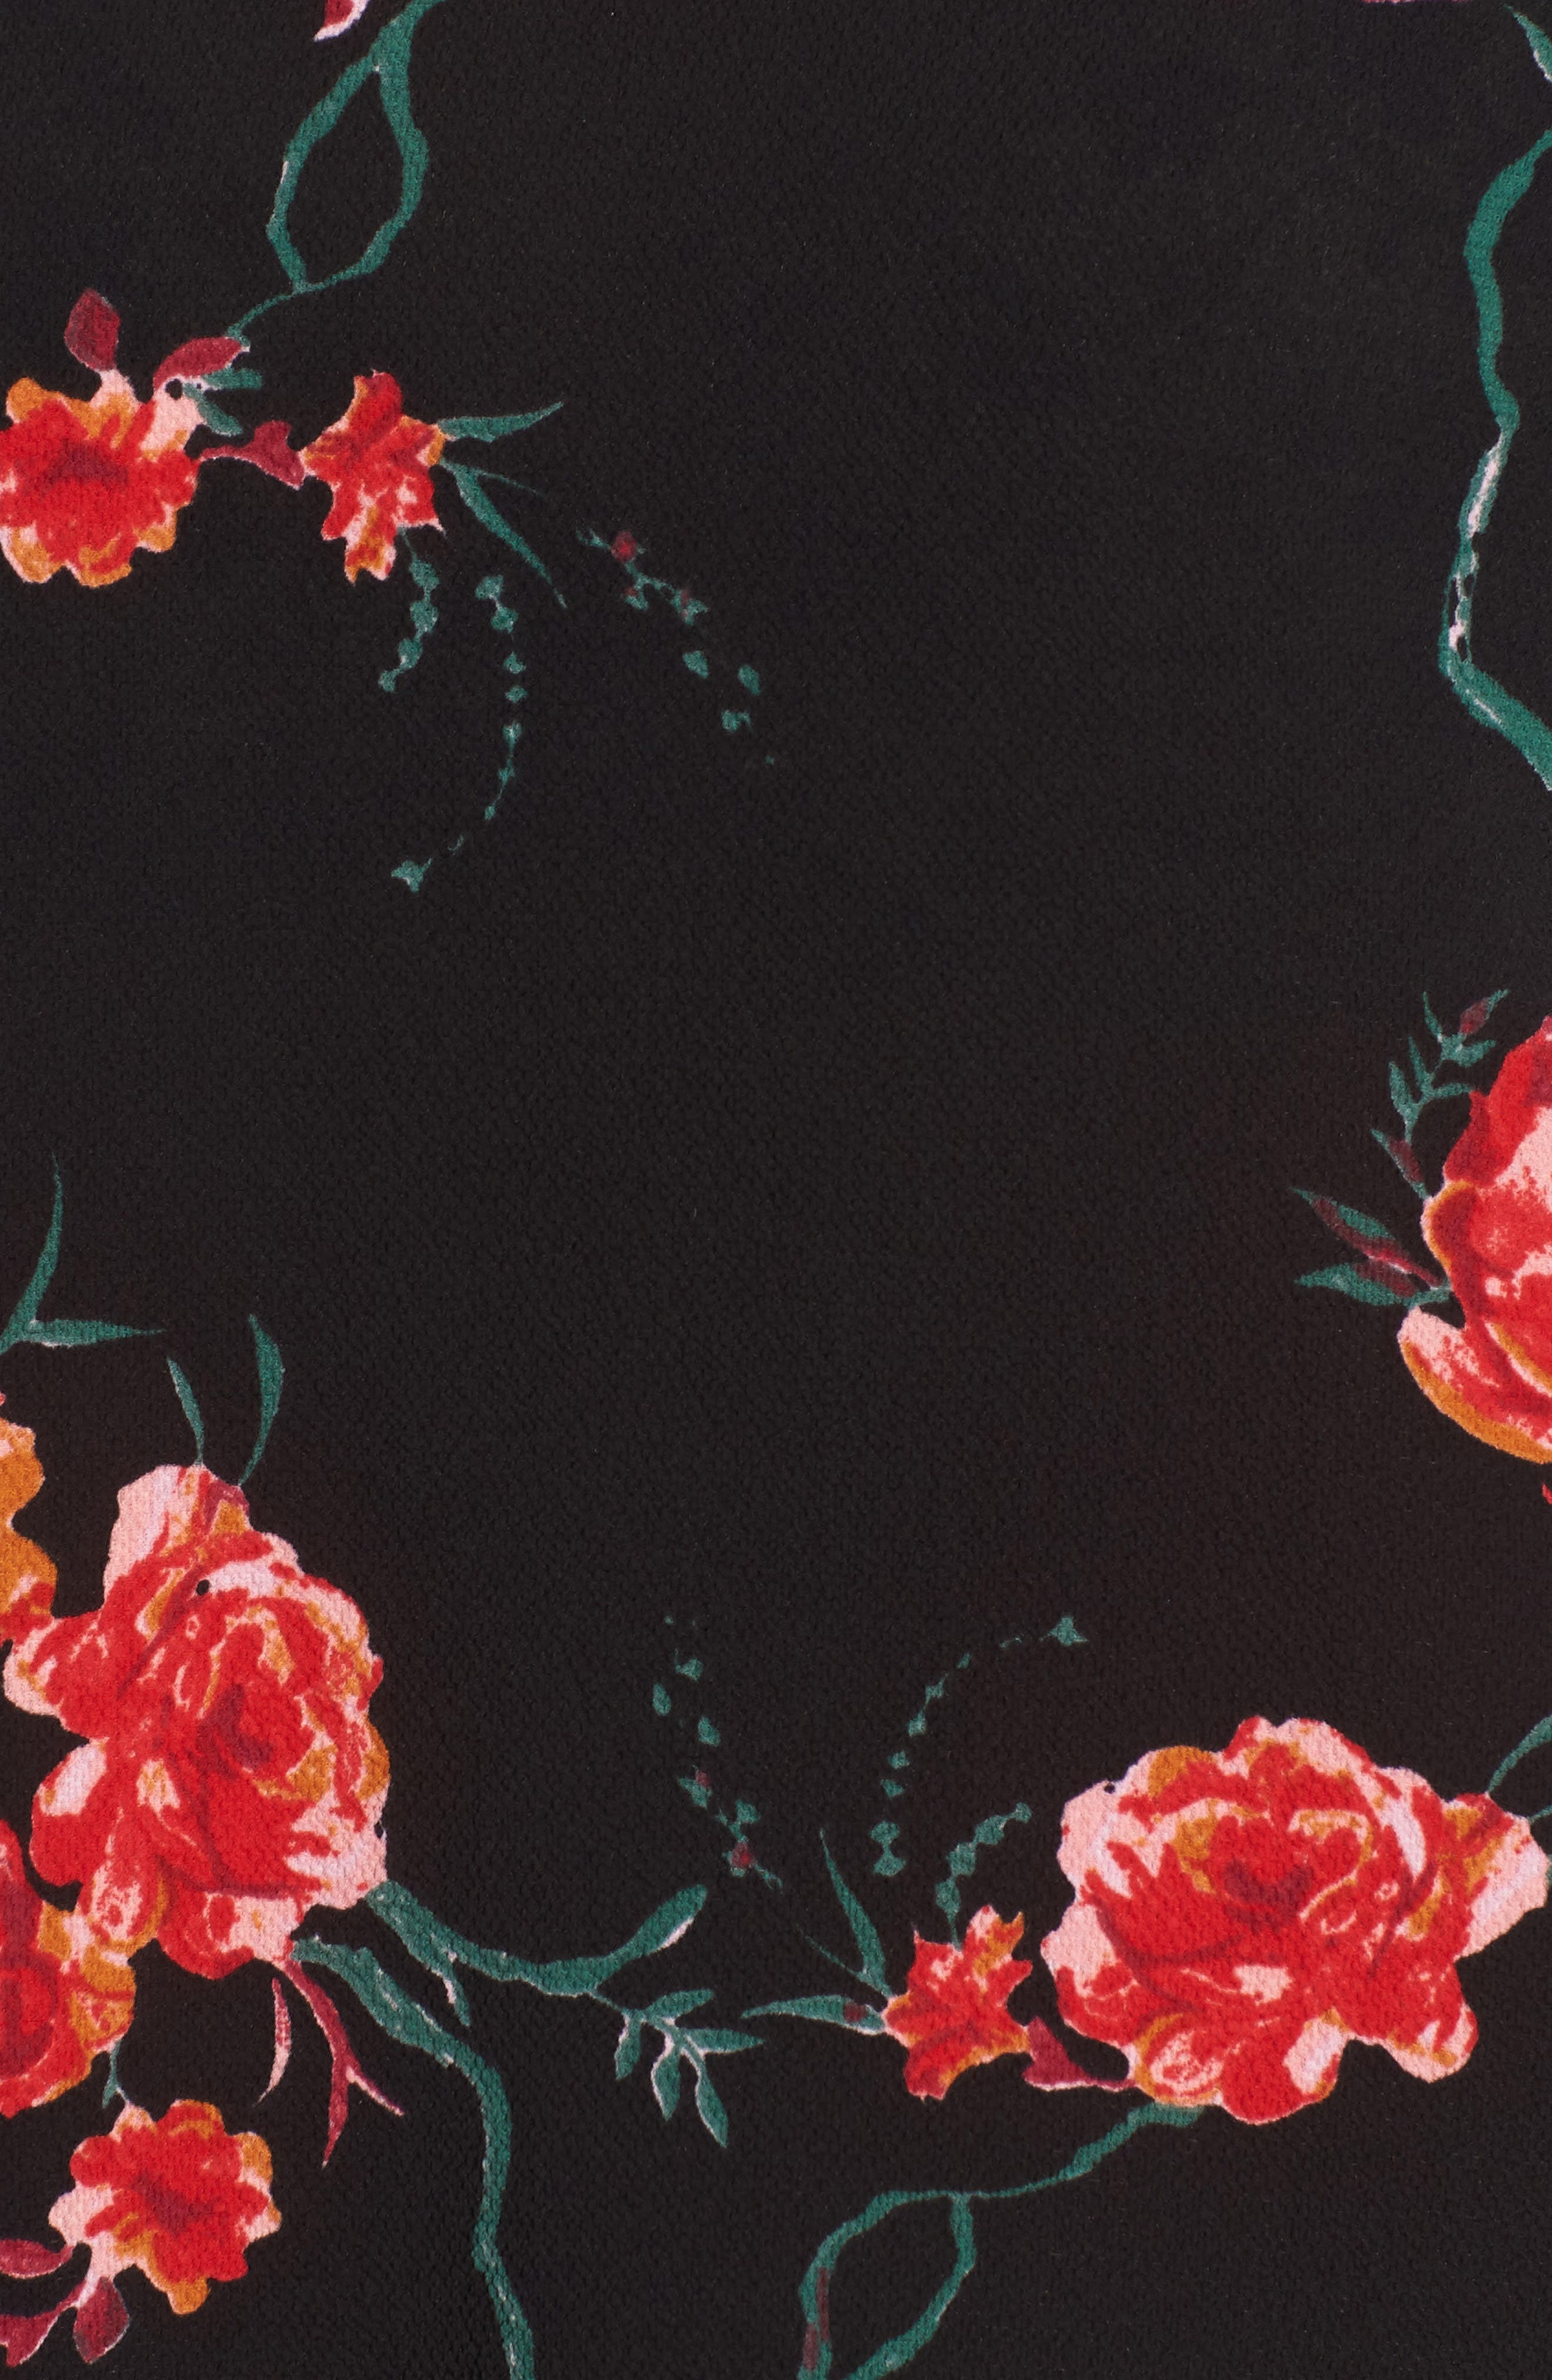 Floral Print Mock Neck Blouse,                             Alternate thumbnail 6, color,                             001